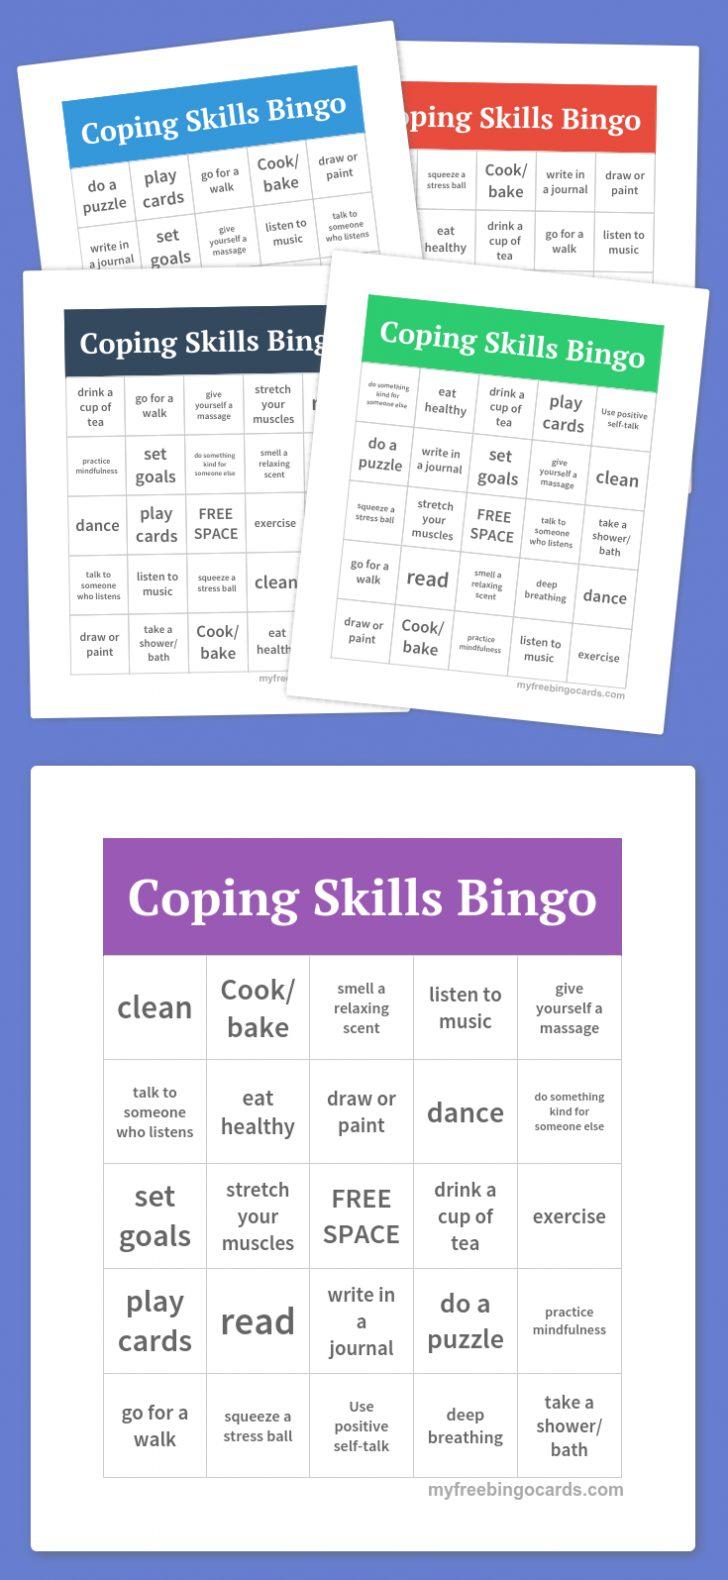 Free Printable Coping Skills Bingo Cards